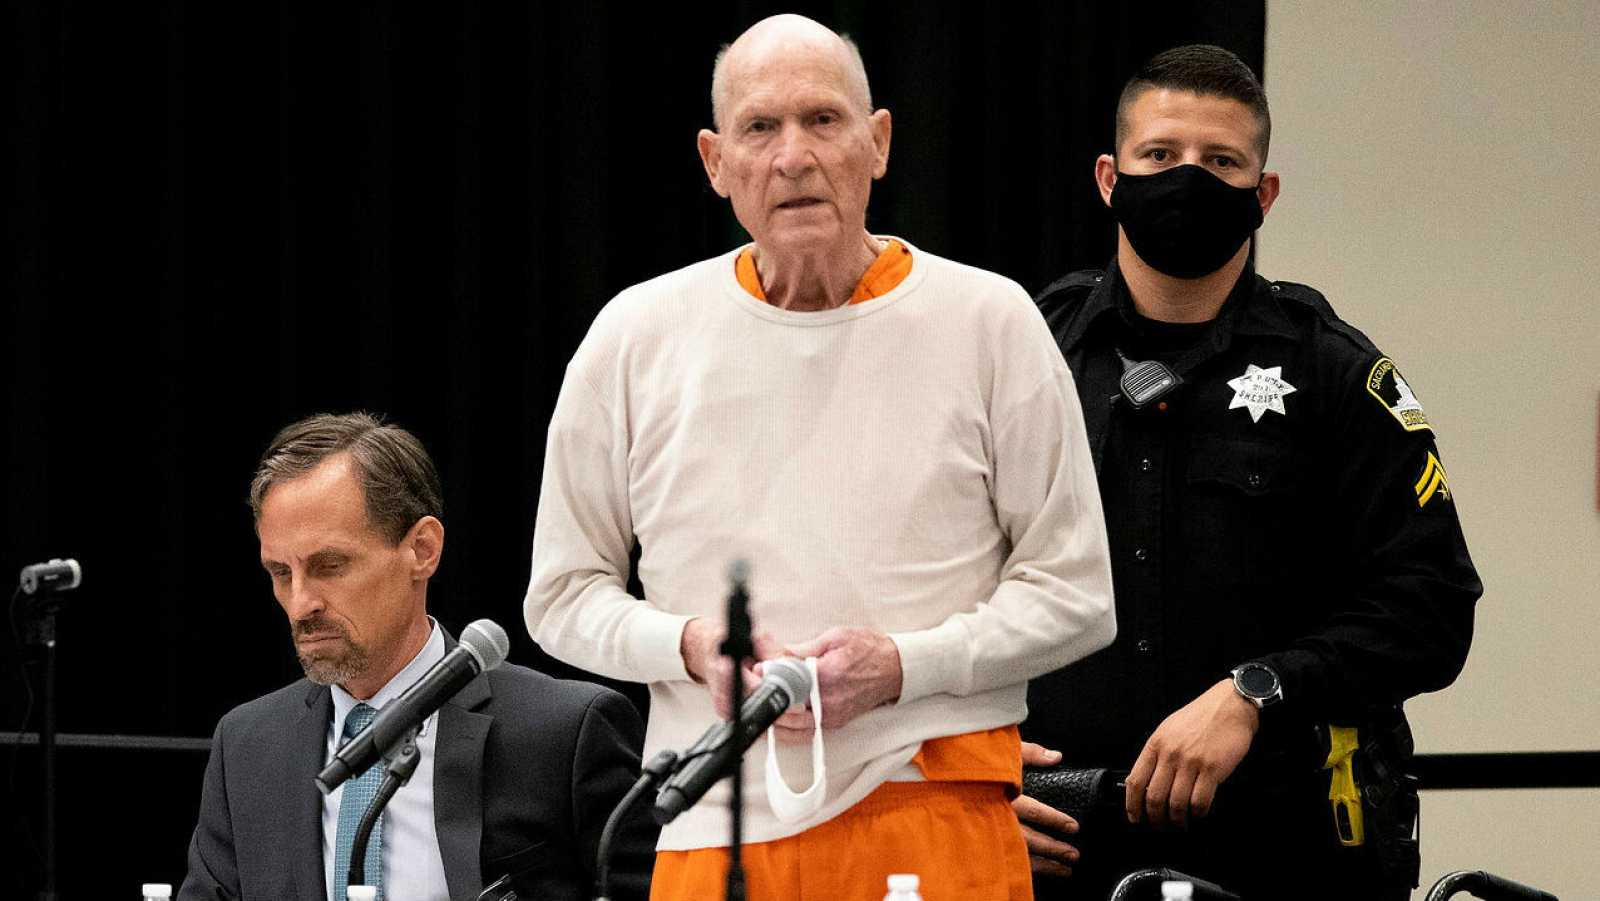 Joseph James DeAngelo Jr., conocido como 'Golden State Killer', ofrece una breve disculpa antes de ser sentenciado a cadena perpetua durante su audiencia de sentencia en CSU Sacramento, California, Estados Unidos.